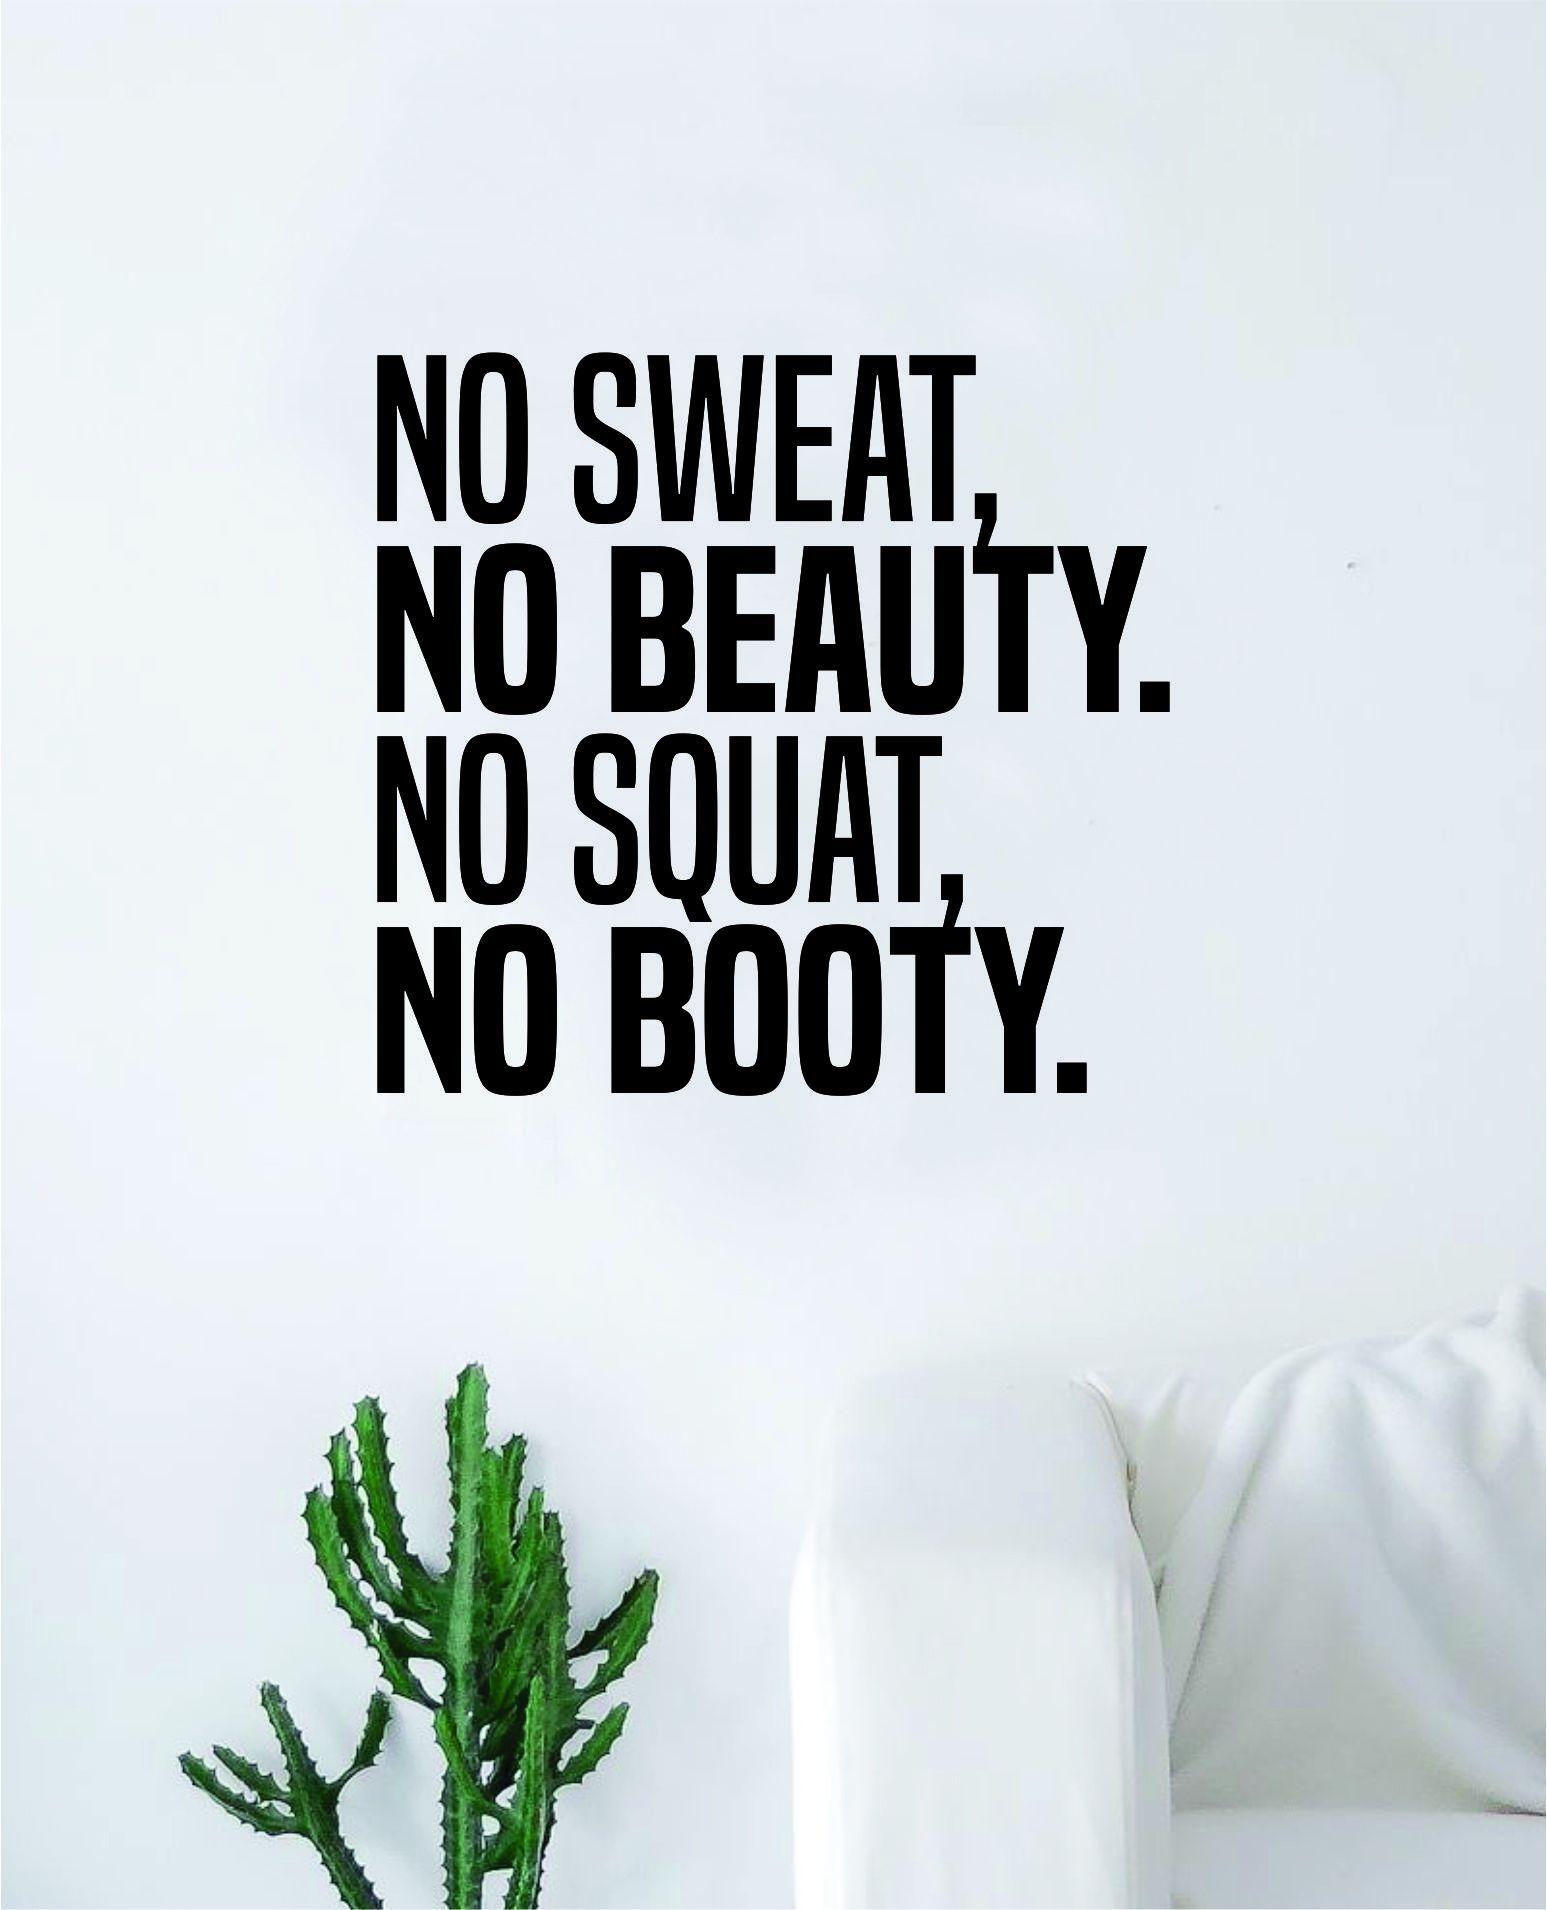 No Sweat Beauty Squat Booty Girls Decal Sticker Wall Vinyl Art Wall Bedroom Room Decor Motivational Inspirational Teen Sports Gym Fitness - black